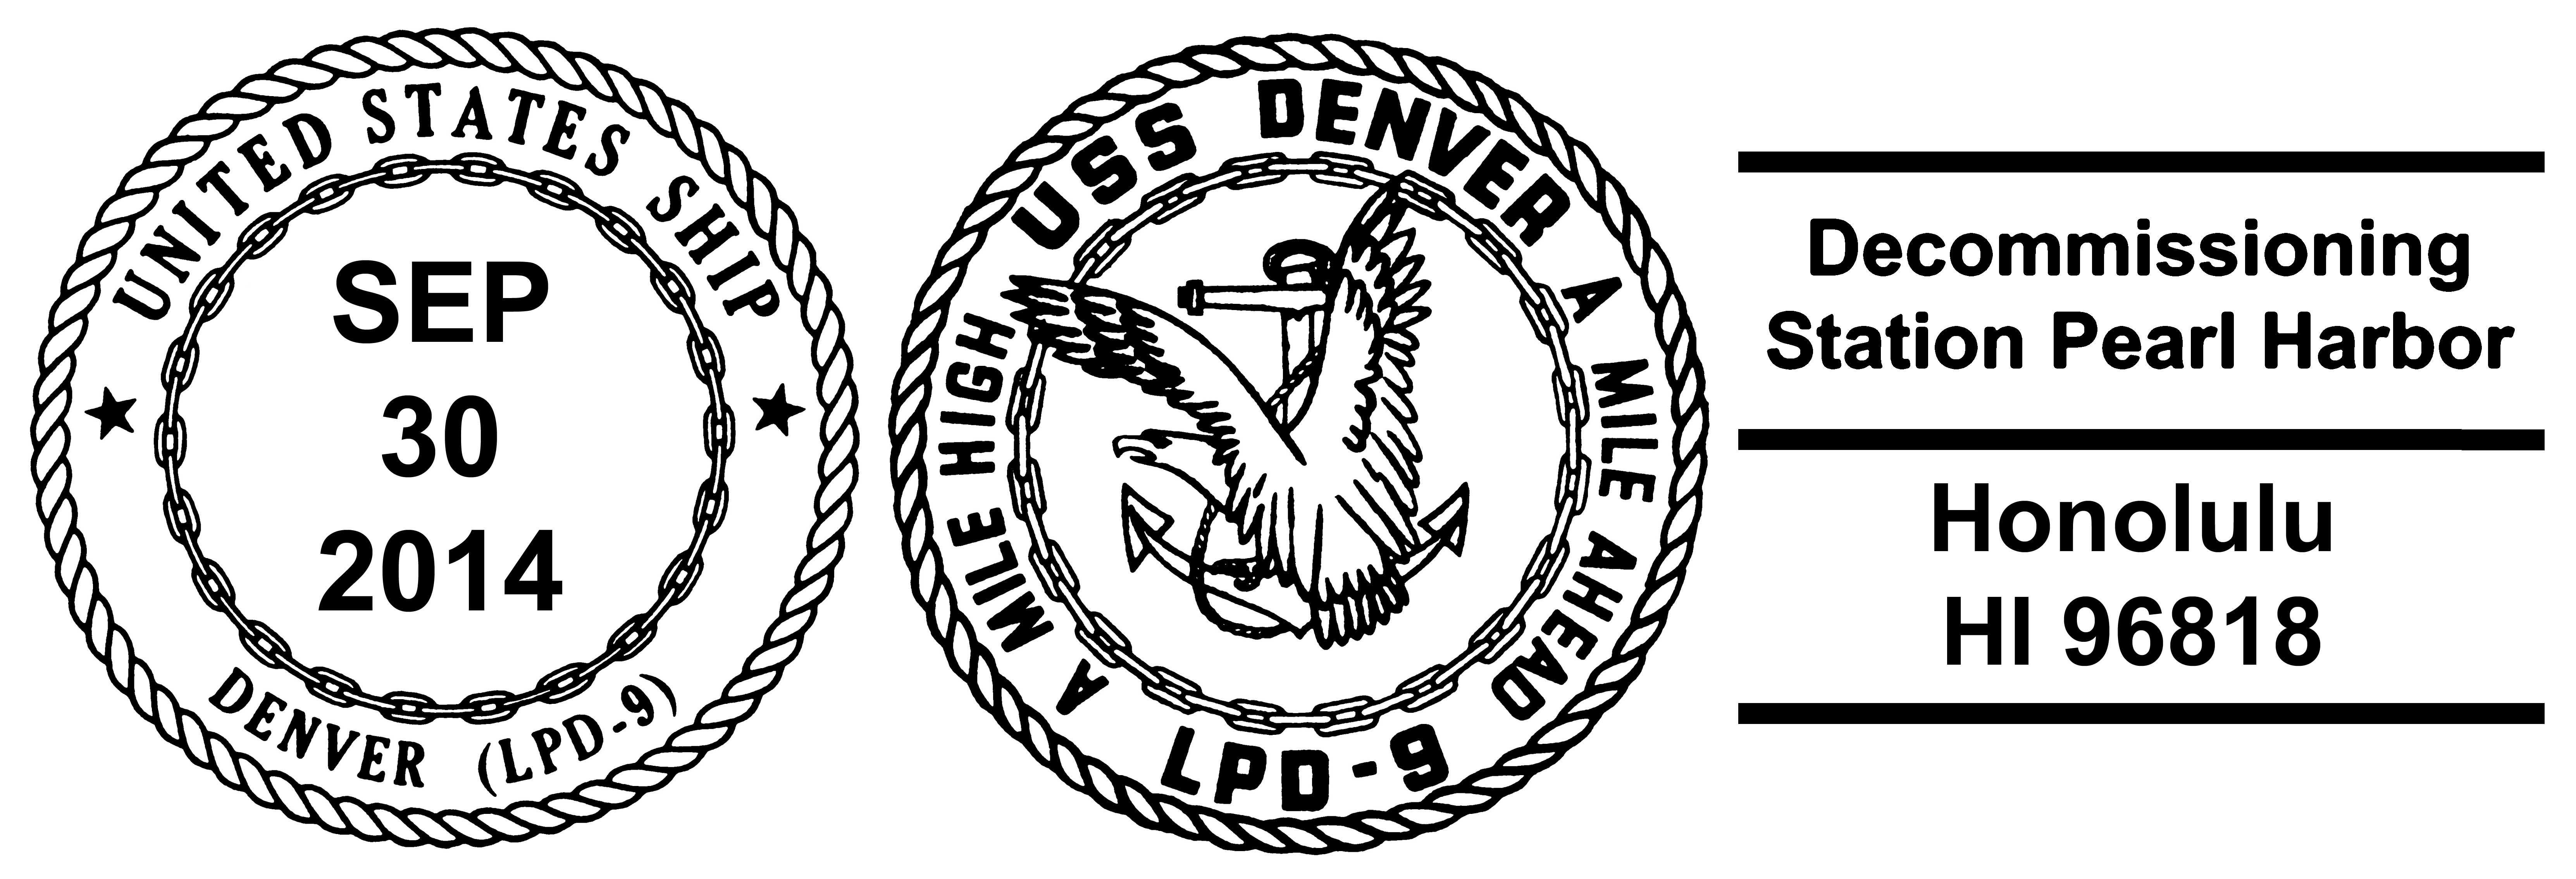 Sonderpoststempel USS DENVER LPD-9 Decommissioning Design: Wolfgang Hechler